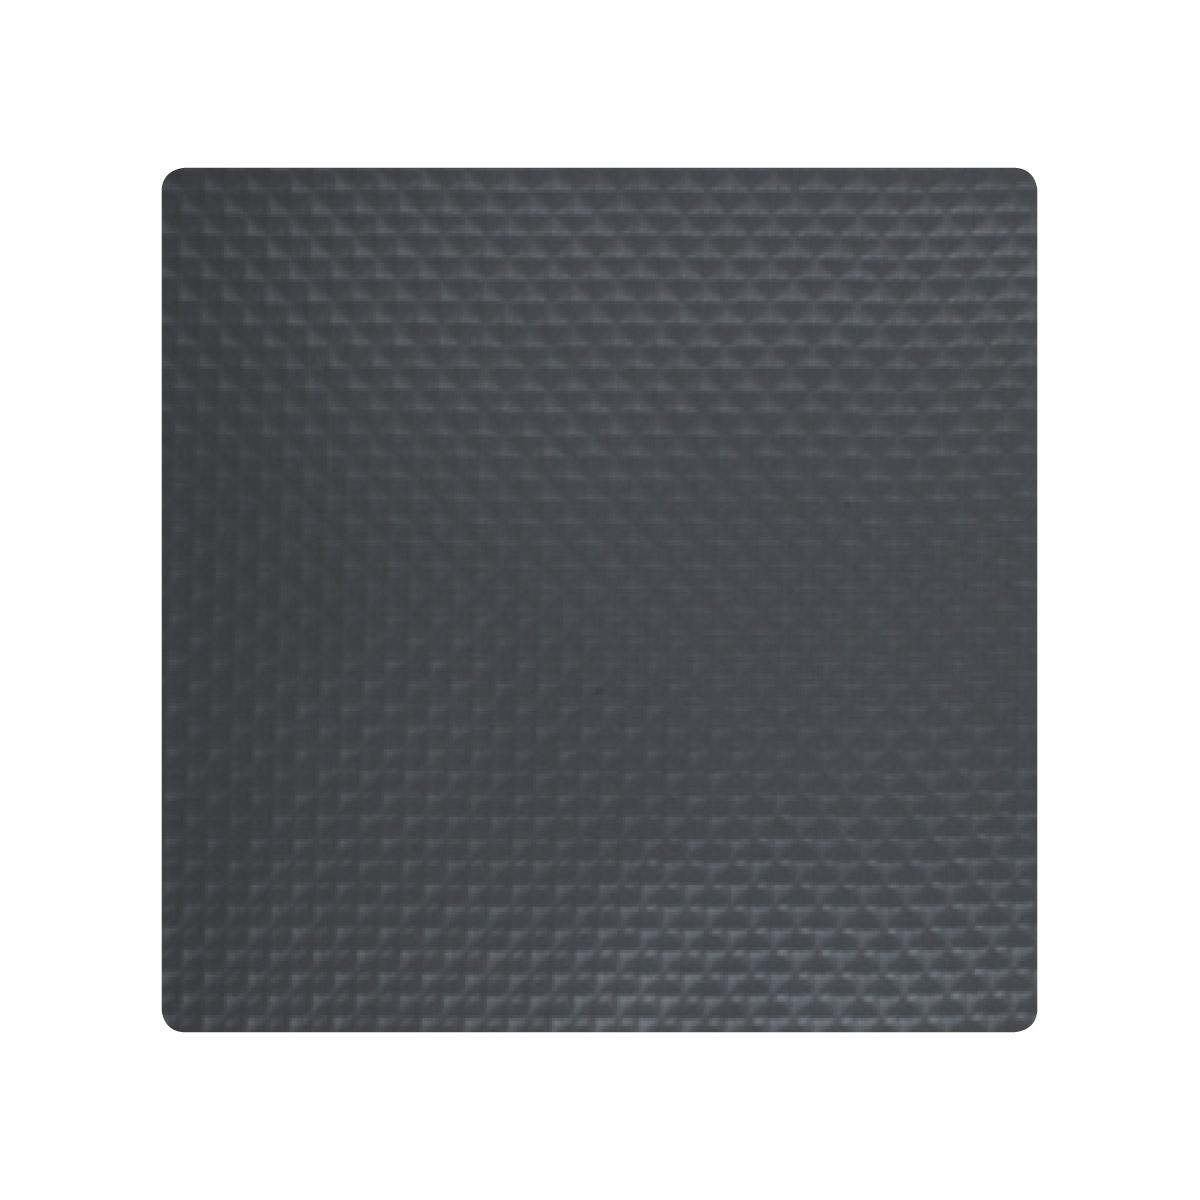 PVC natural pool liner deluxe, reinforced, dark grey, 1,5mm, 165 cm, l=25 m PVC natural pool liner deluxe, reinforced, dark grey, 1,5mm, 165 cm, l=25 m